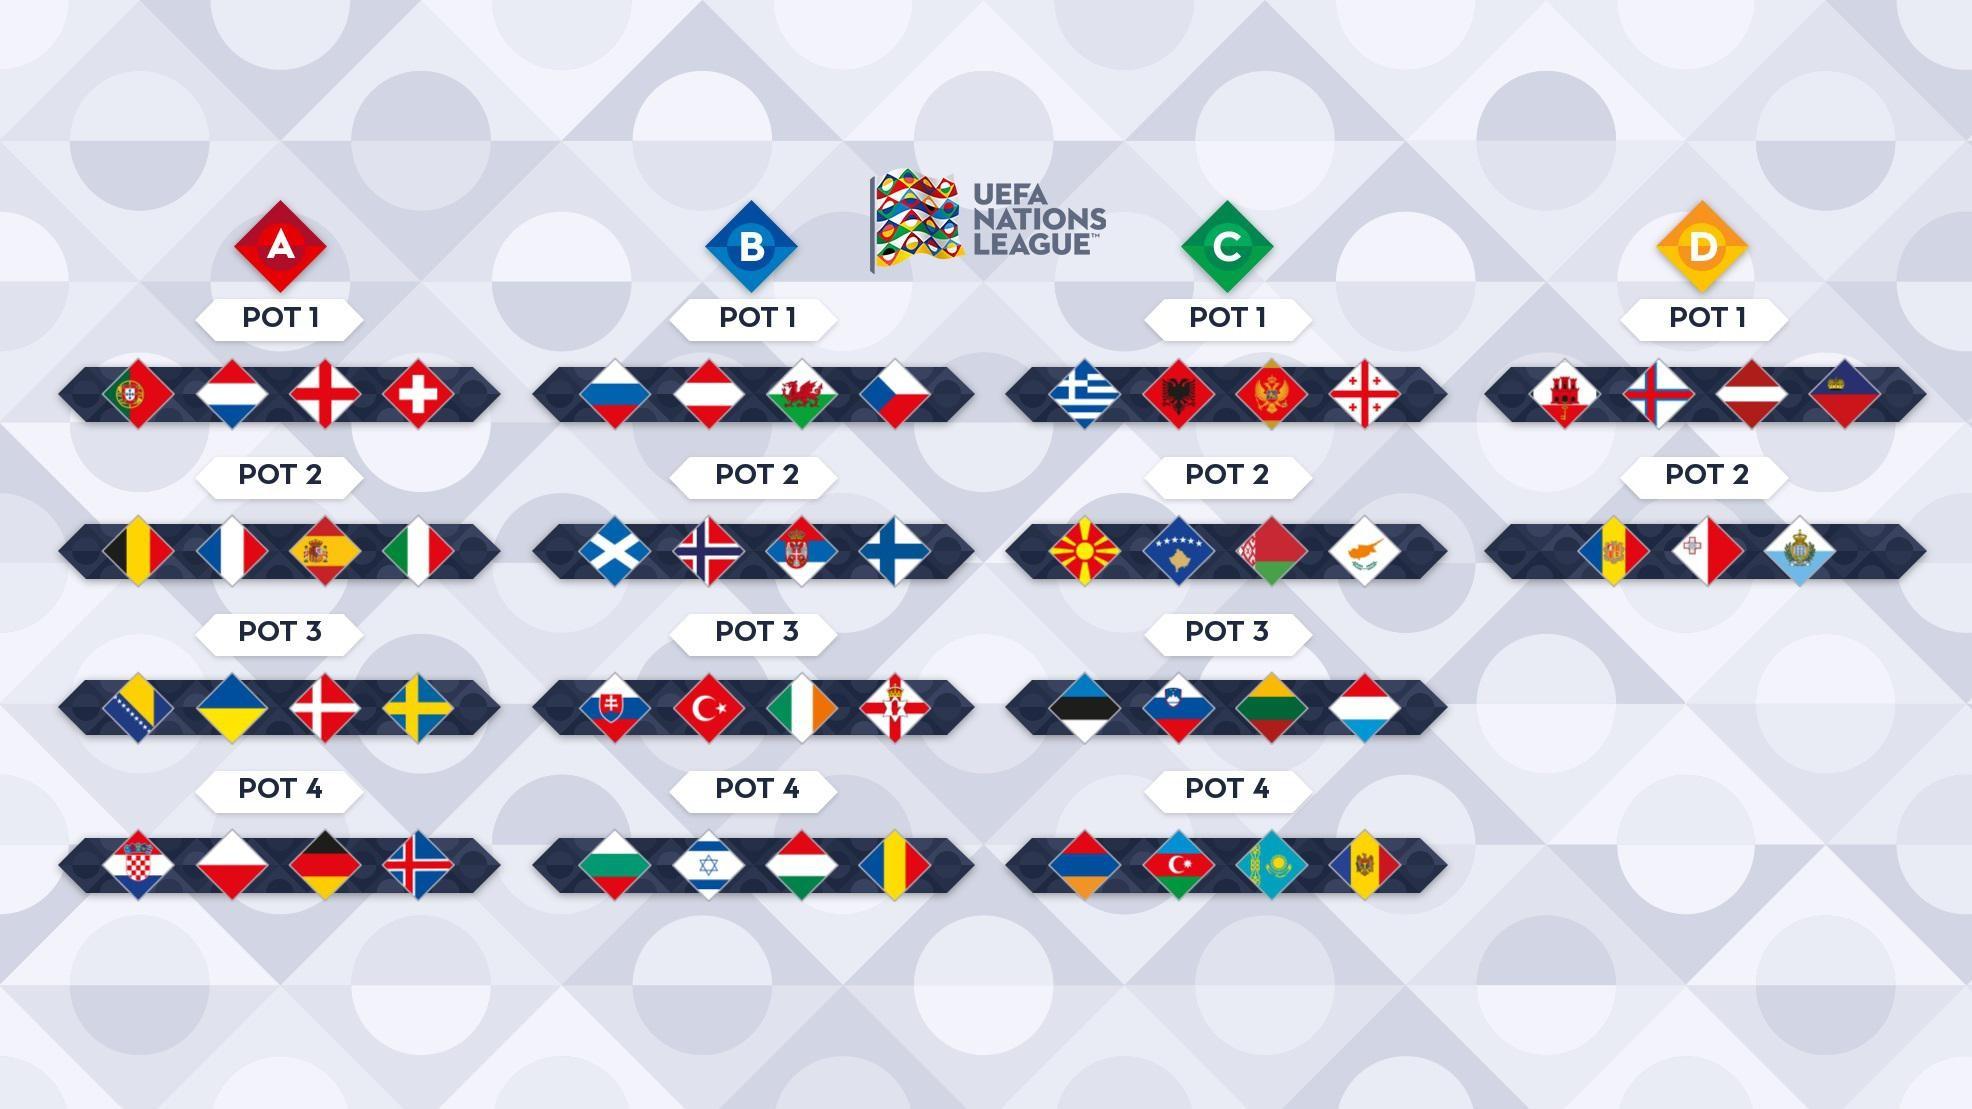 https://i.eurosport.com/2020/03/03/2788213.jpg